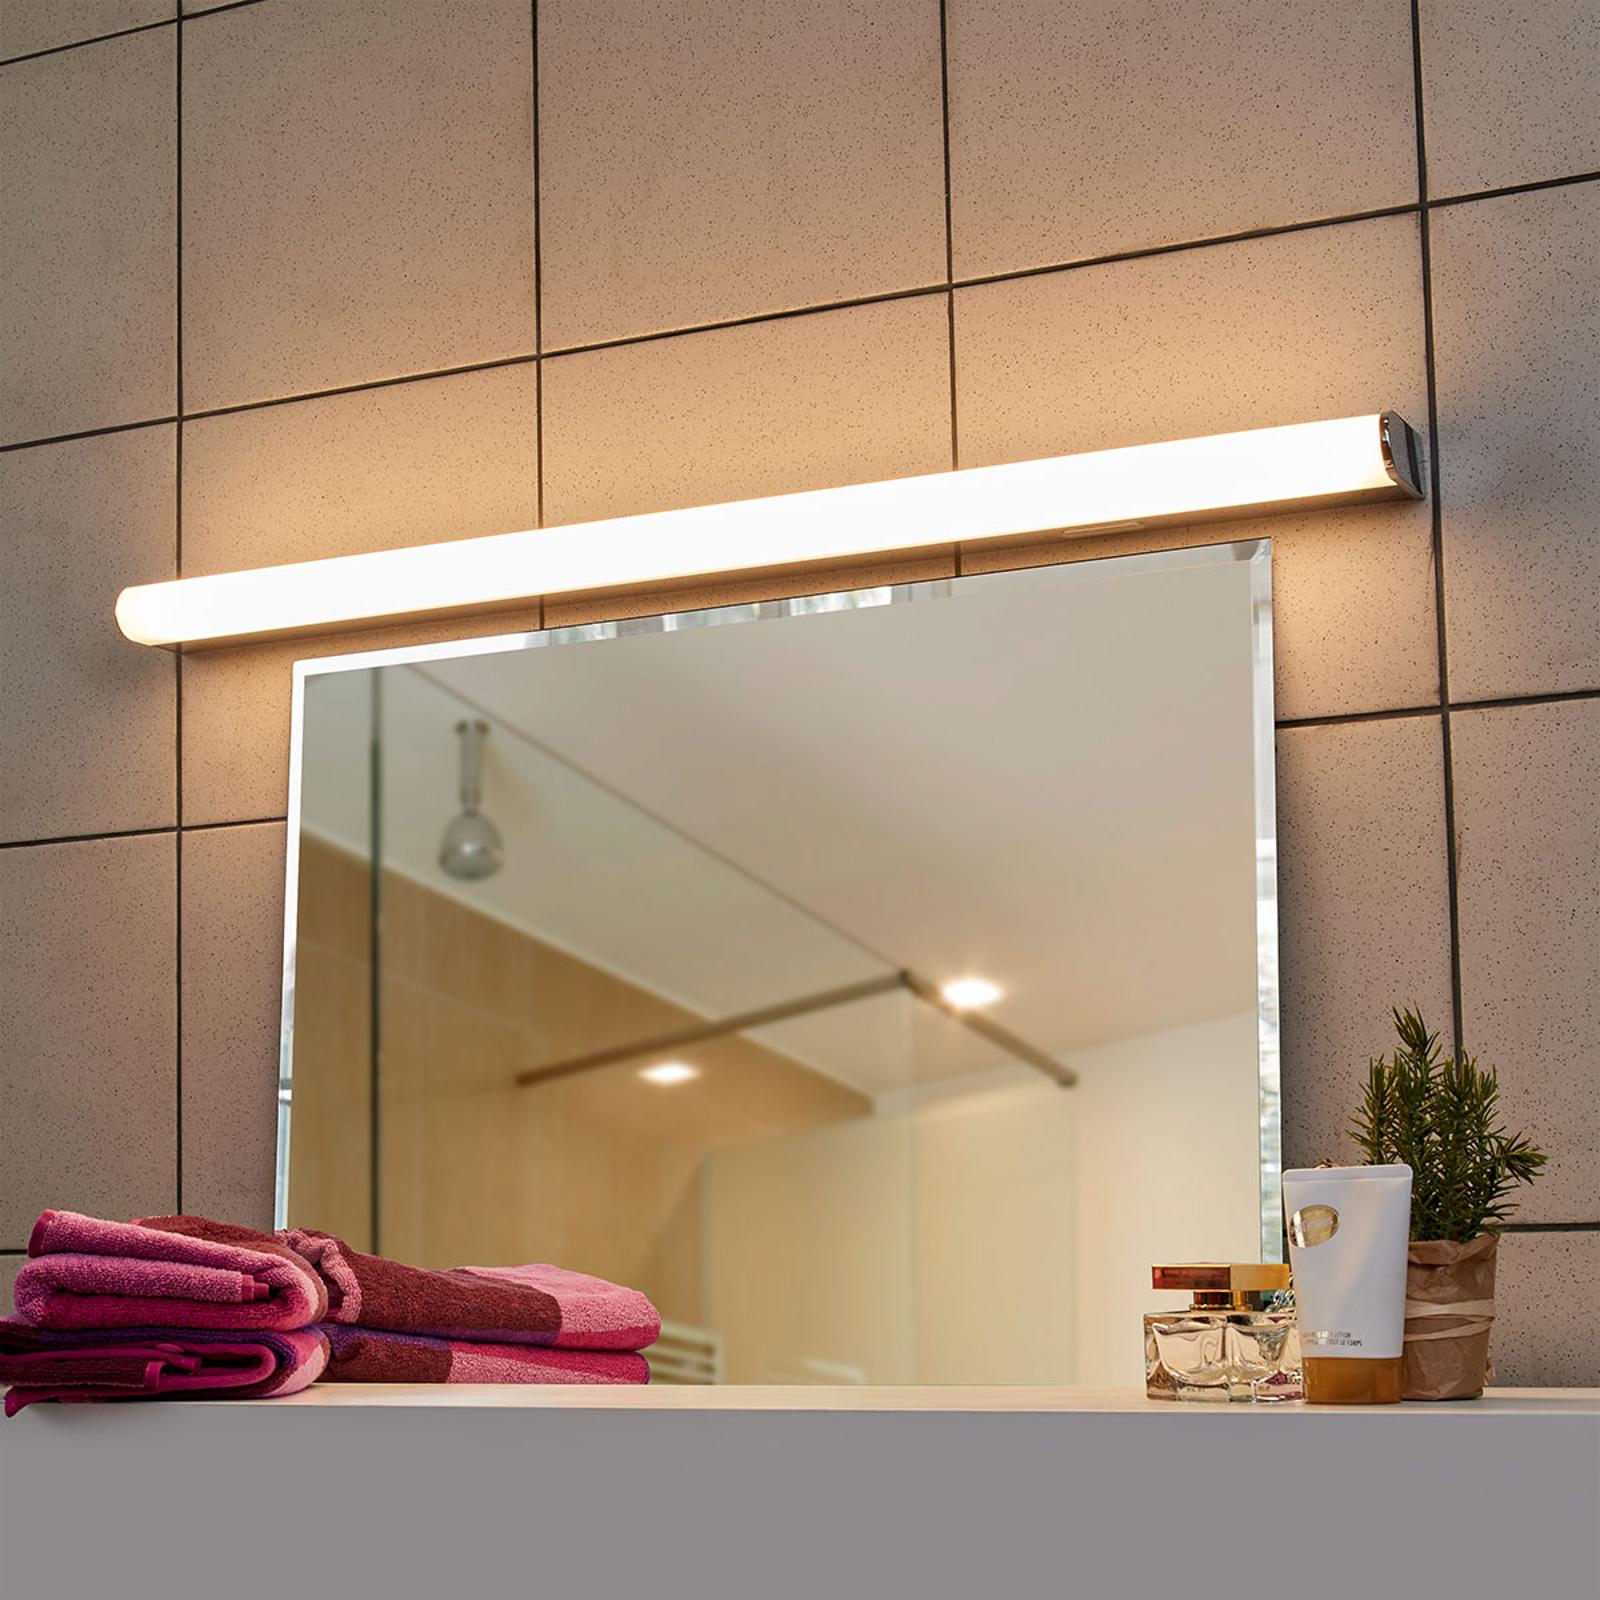 LED-Wandleuchte Jesko Bad 3.000-6.500K, 89cm